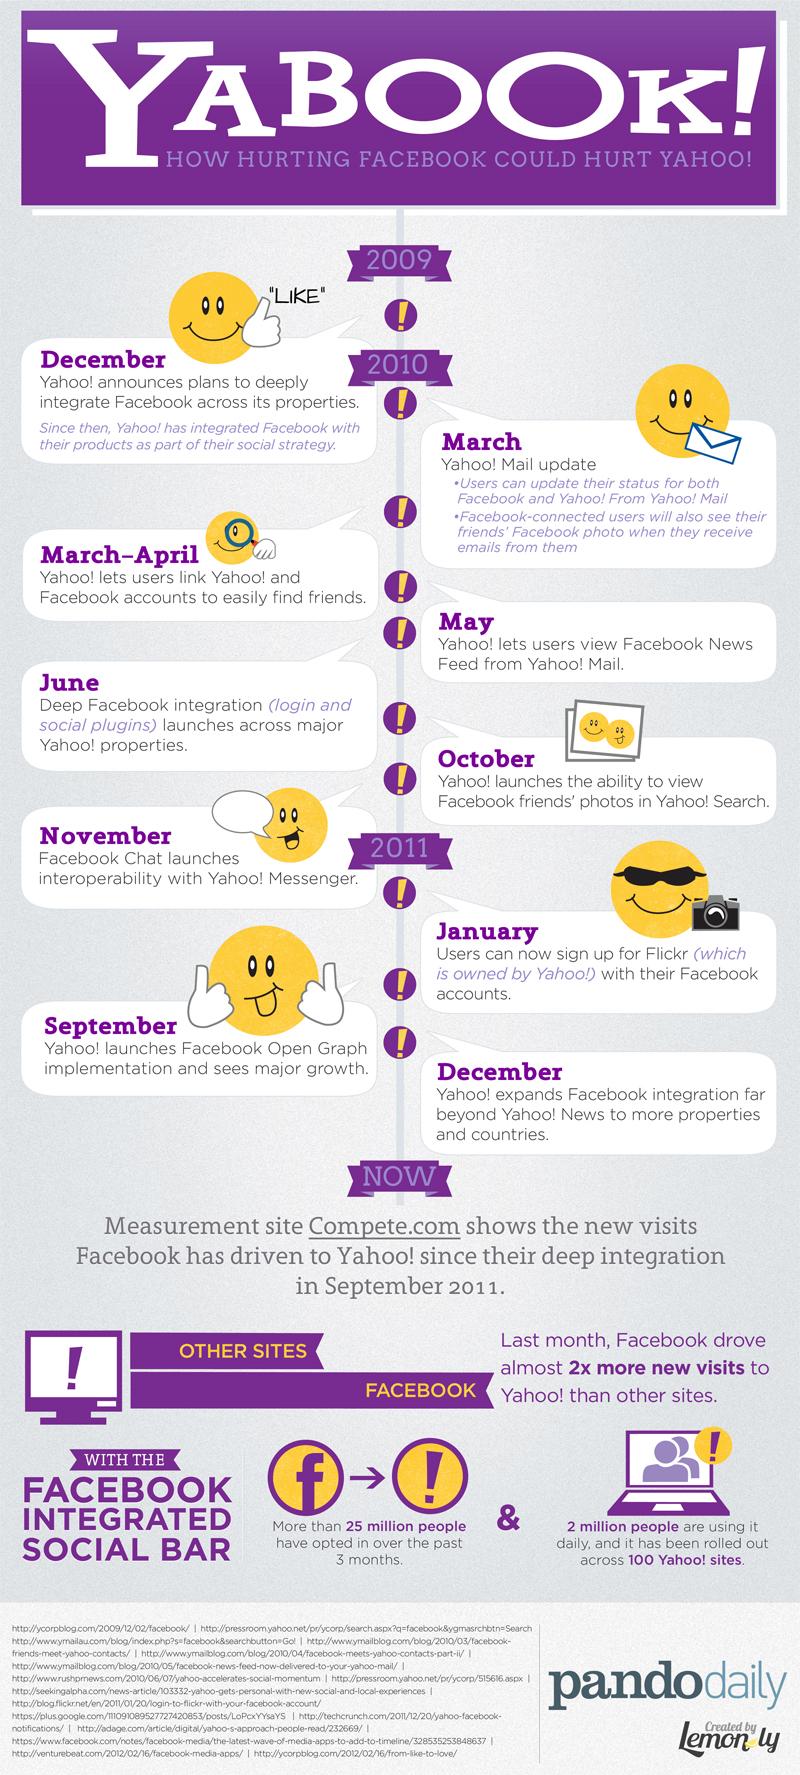 Yabook!: Yahoo And Facebook